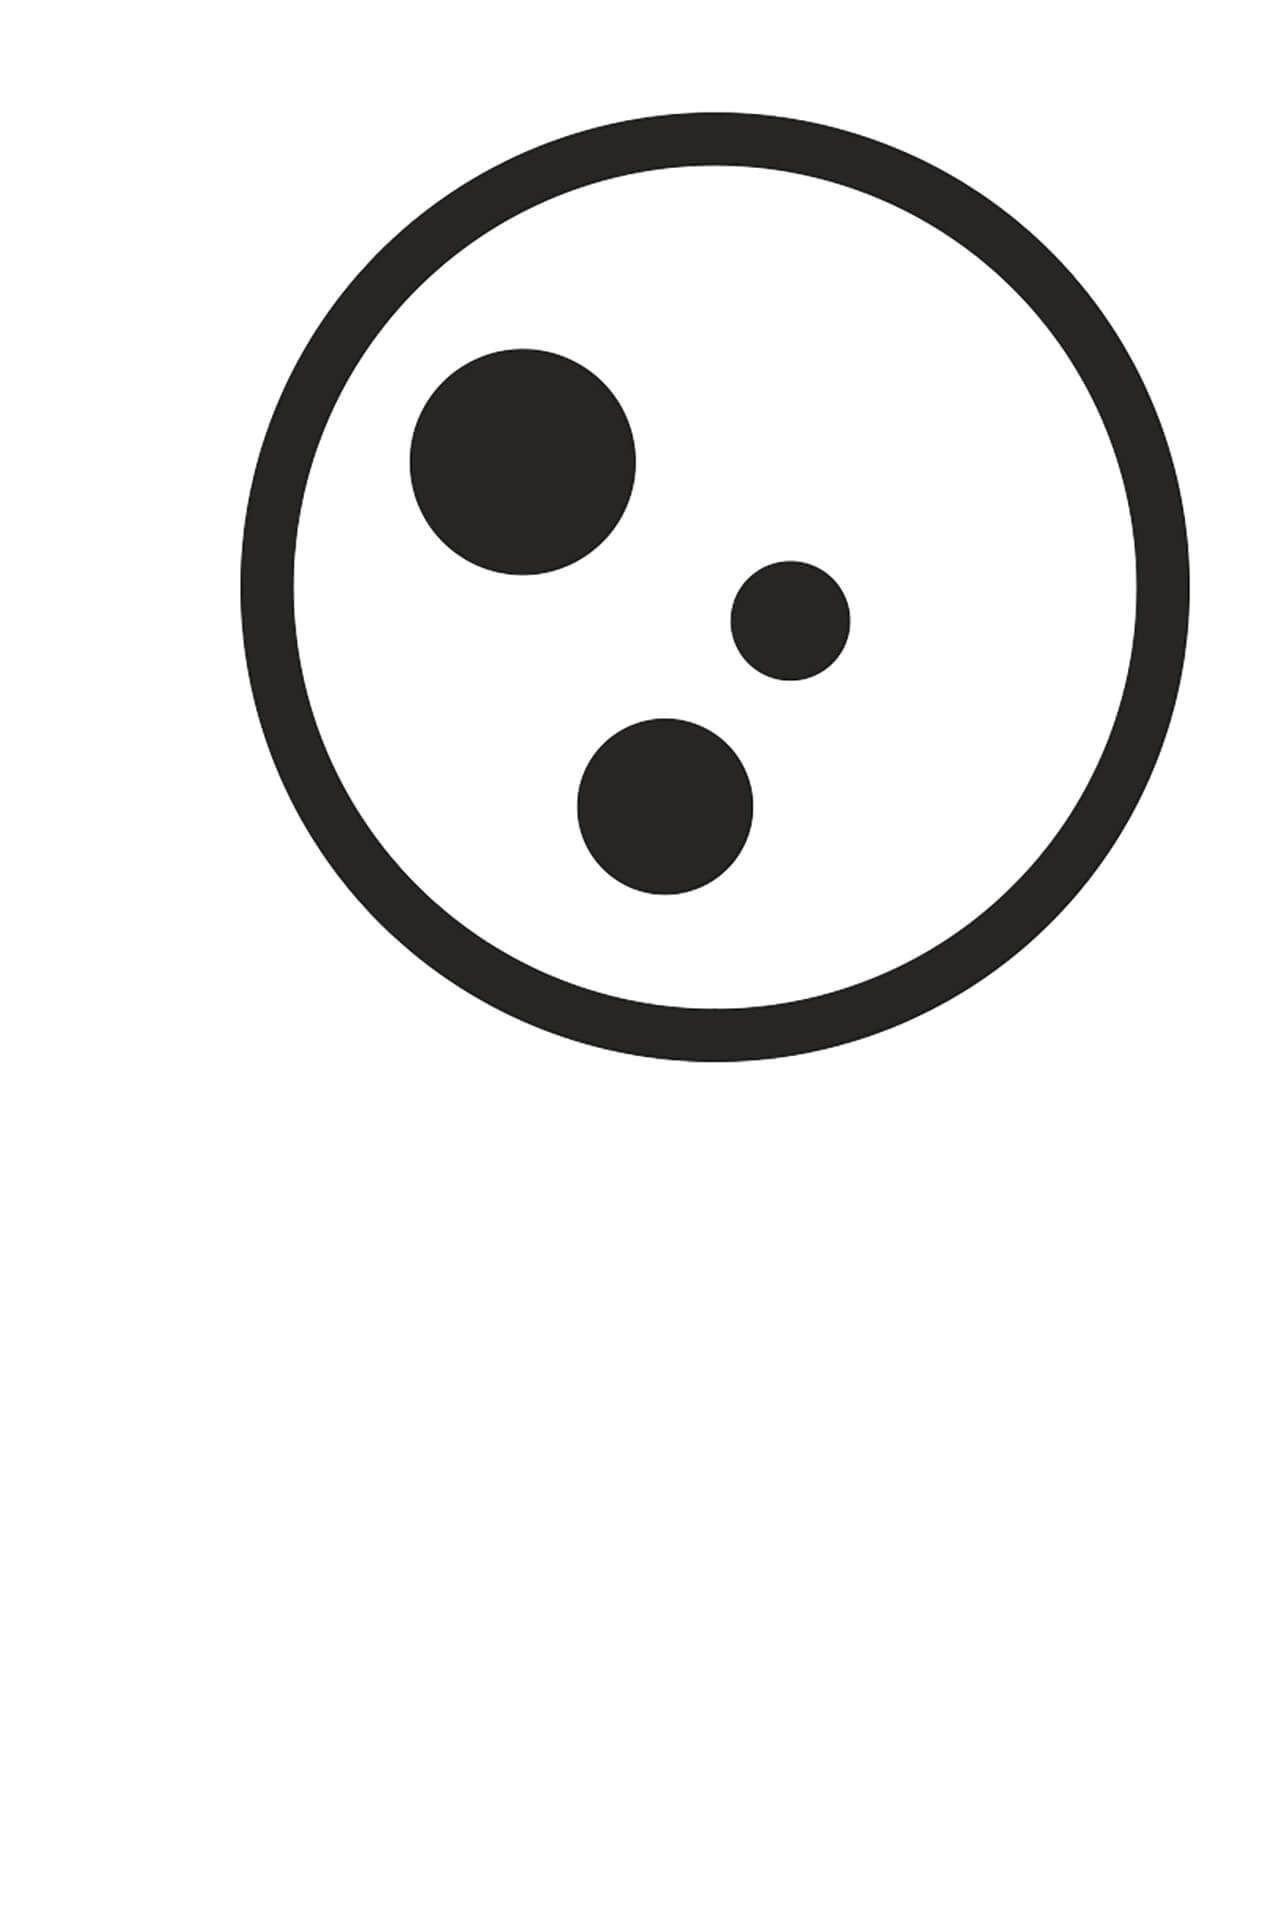 La naissance du logo JAG